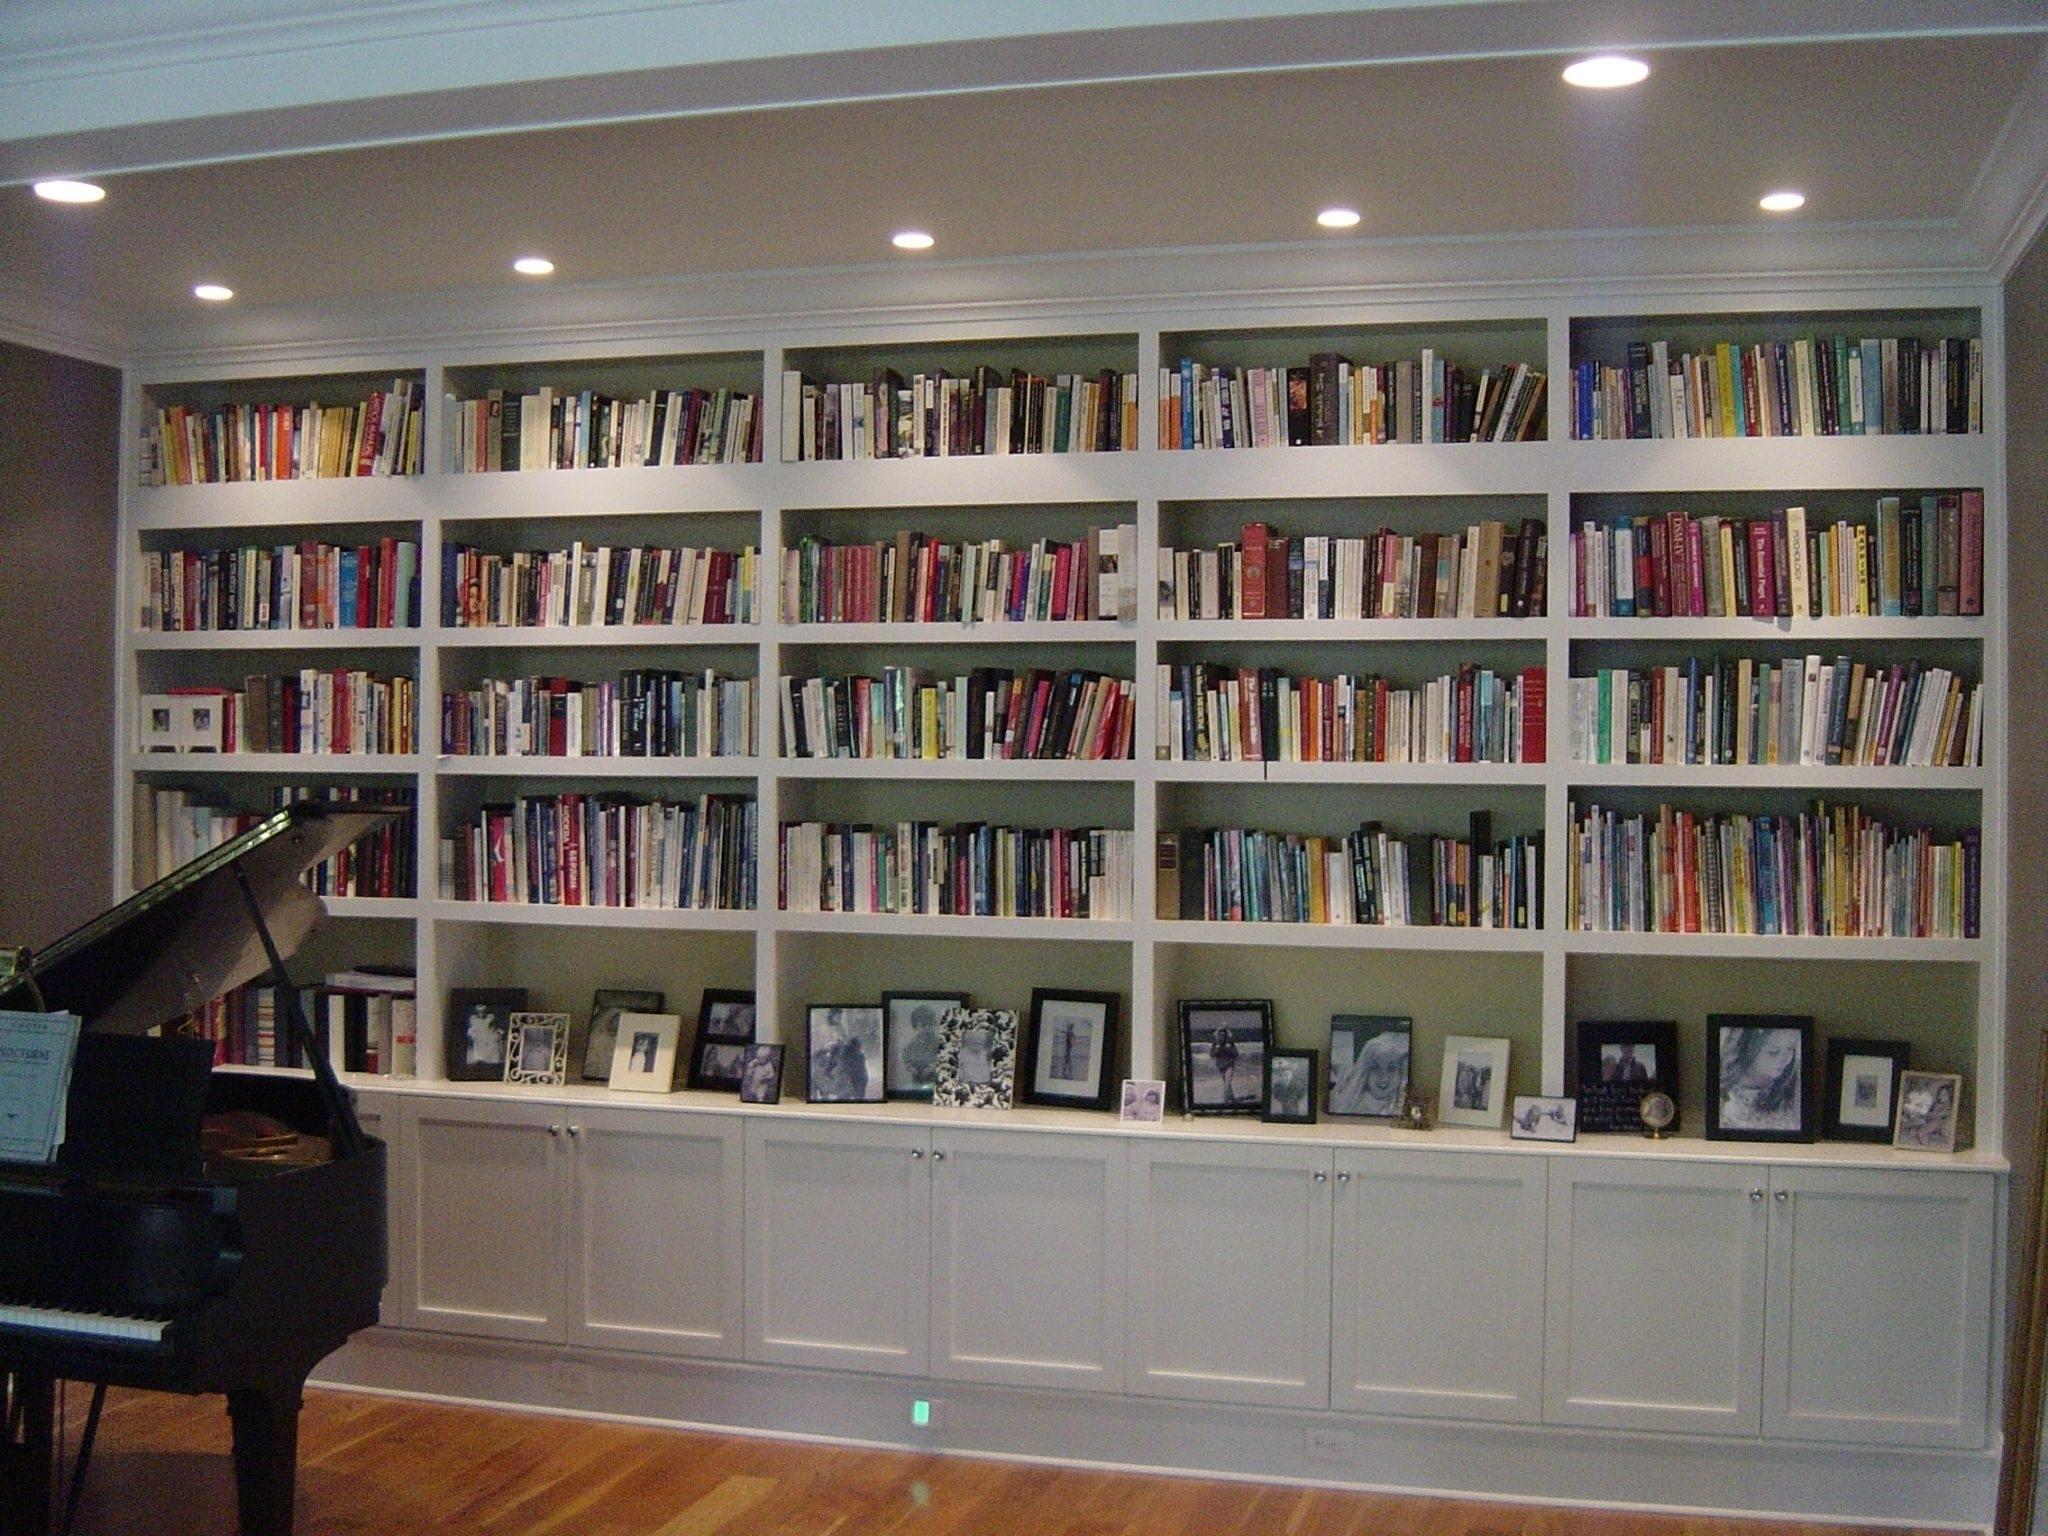 Cheap Bookshelves Regarding Famous Best Cheap Bookshelves American Hwy ~ Idolza (View 7 of 15)